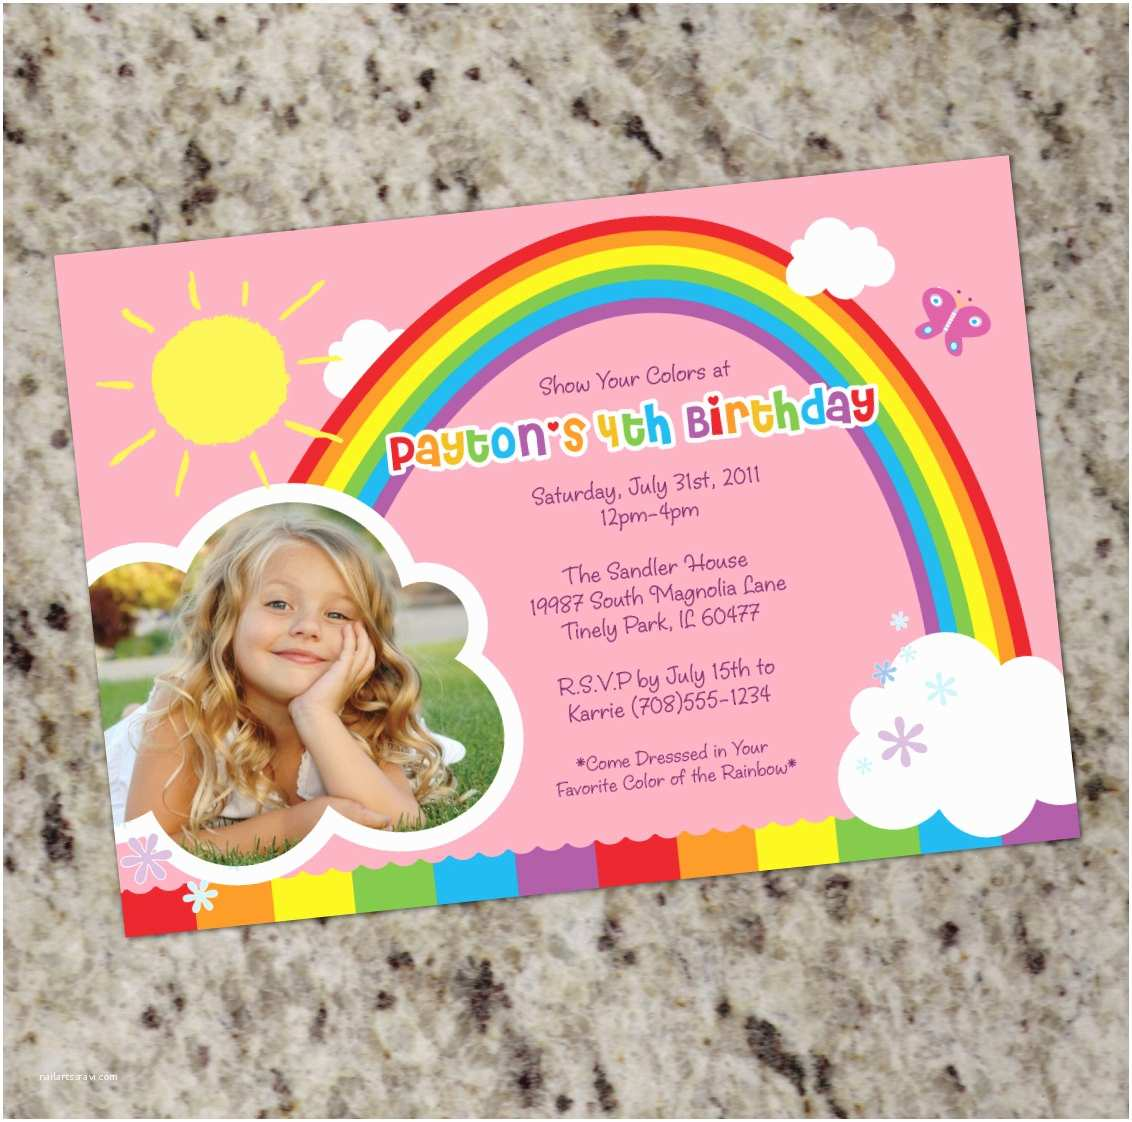 Rainbow Birthday Invitations Rainbow Party Birthday Party Invitations Printable Design